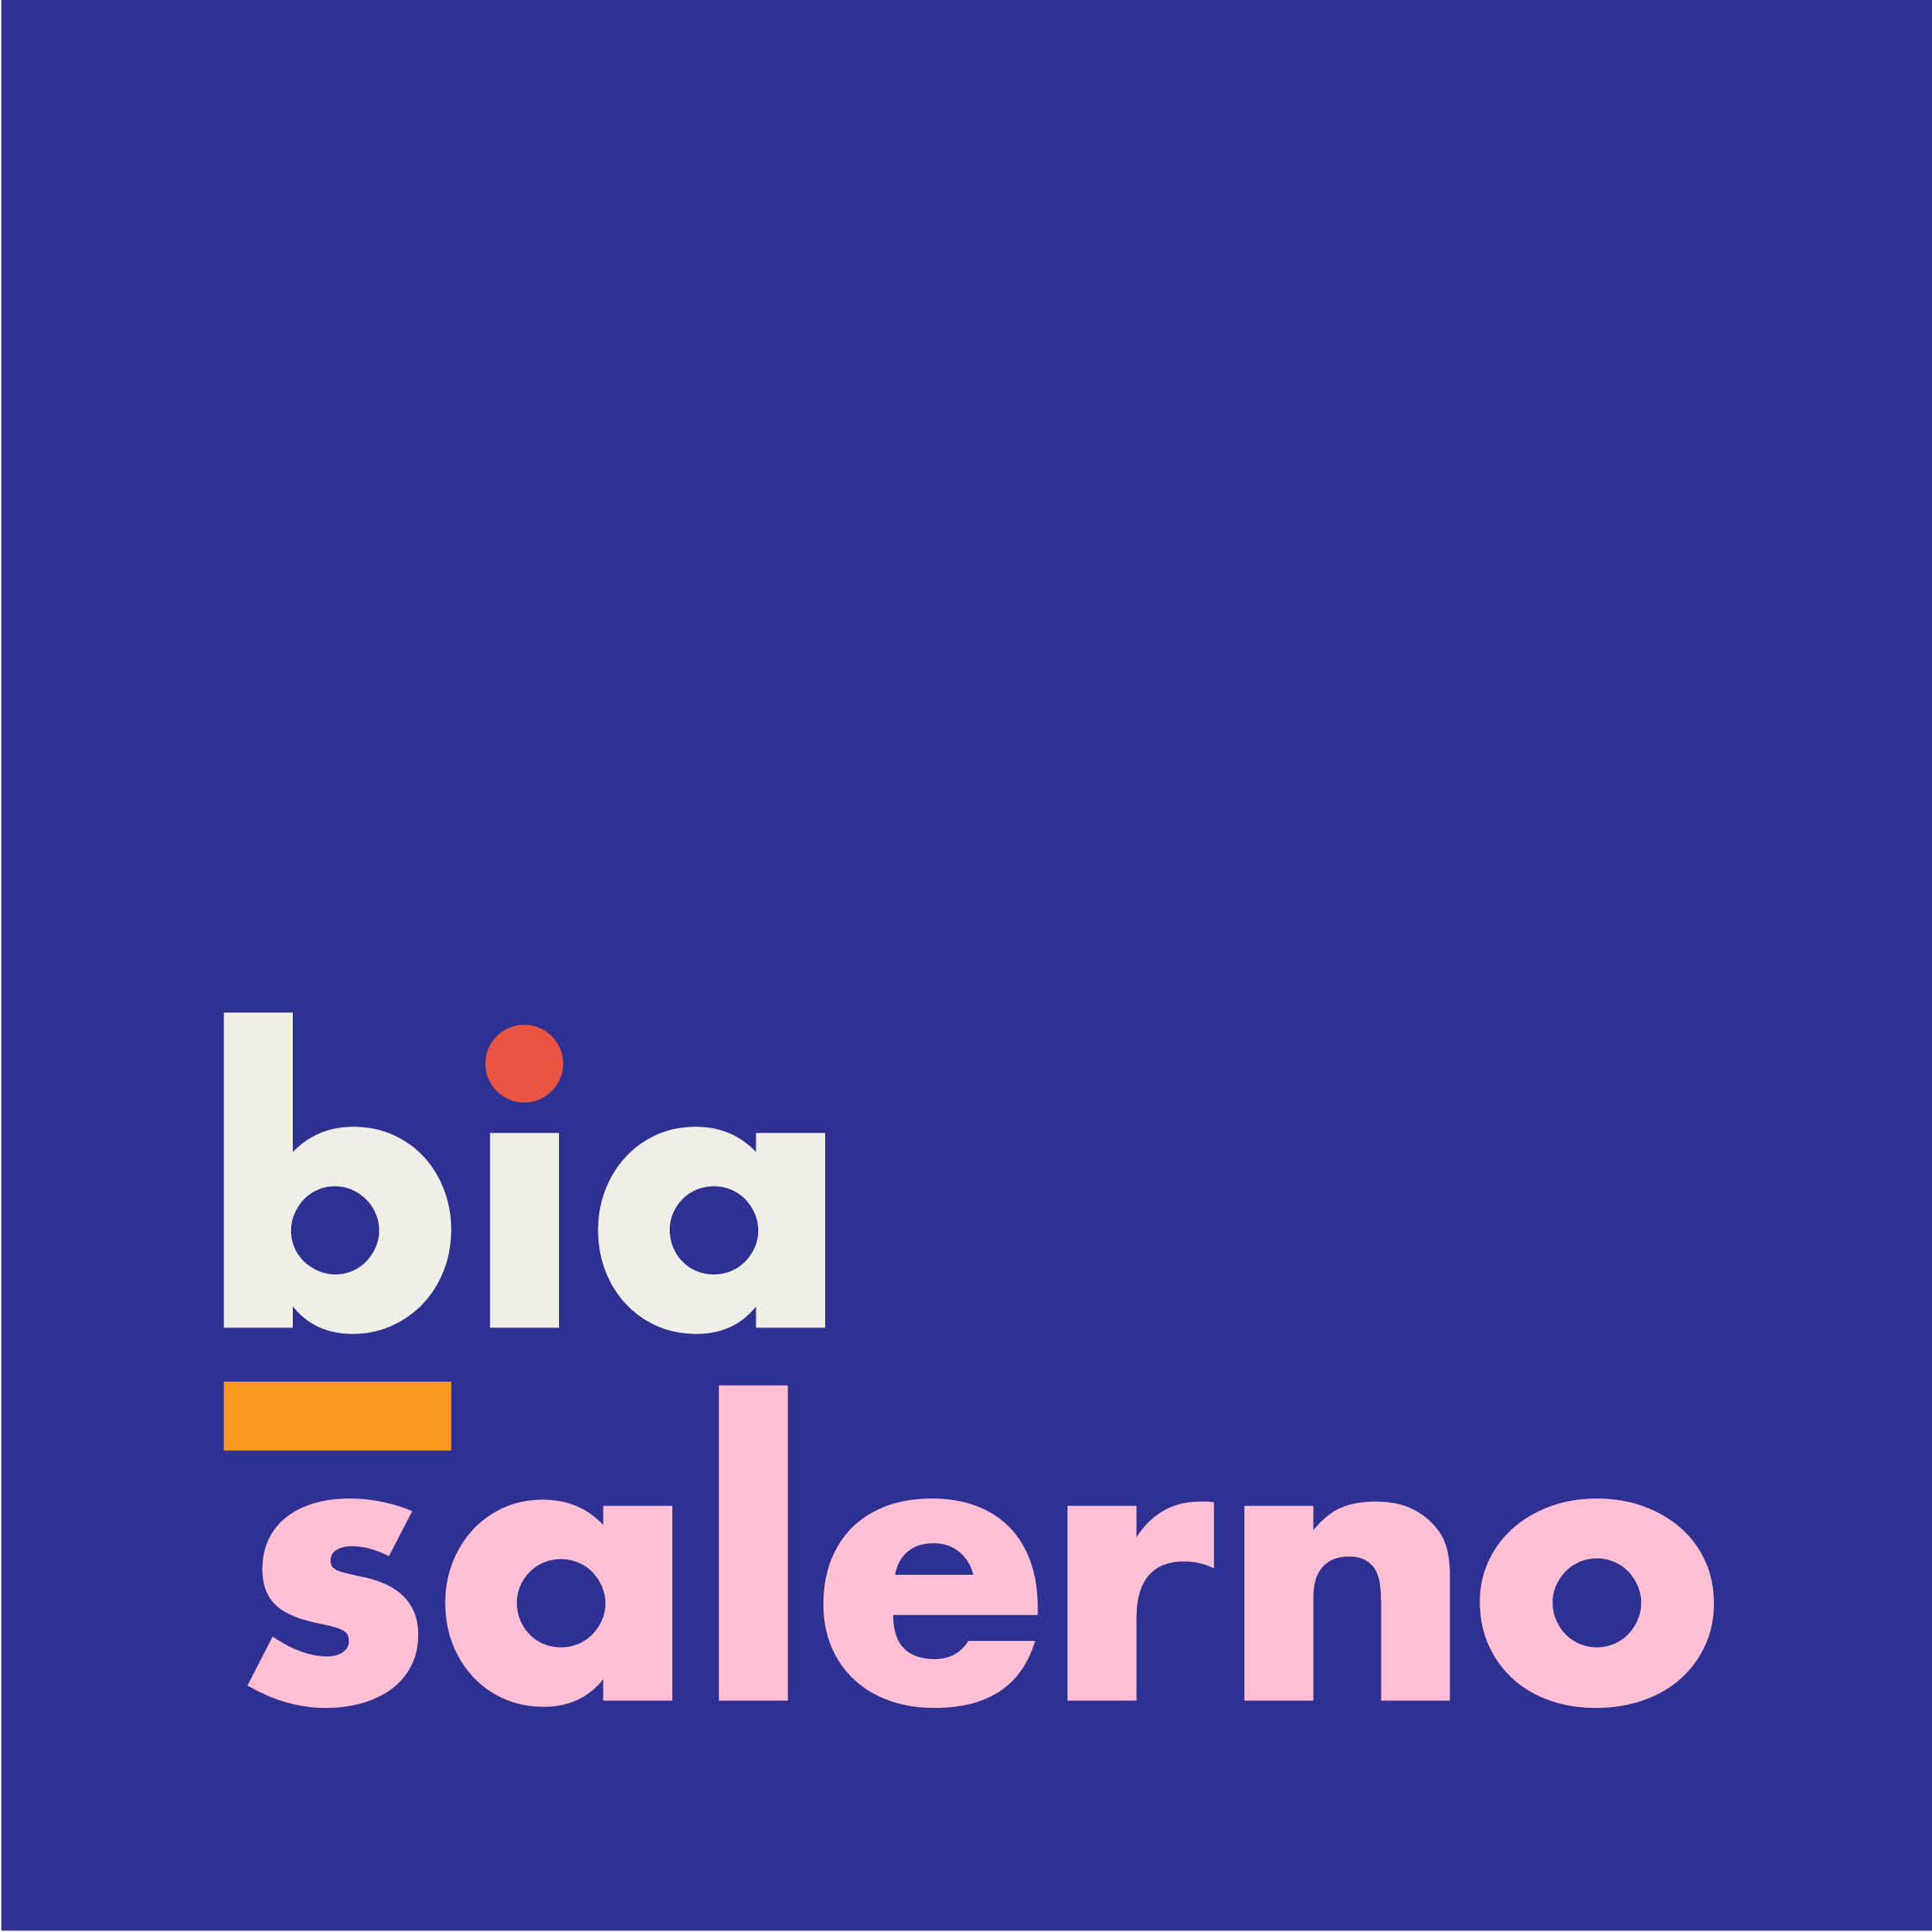 Beatriz Genta Salerno